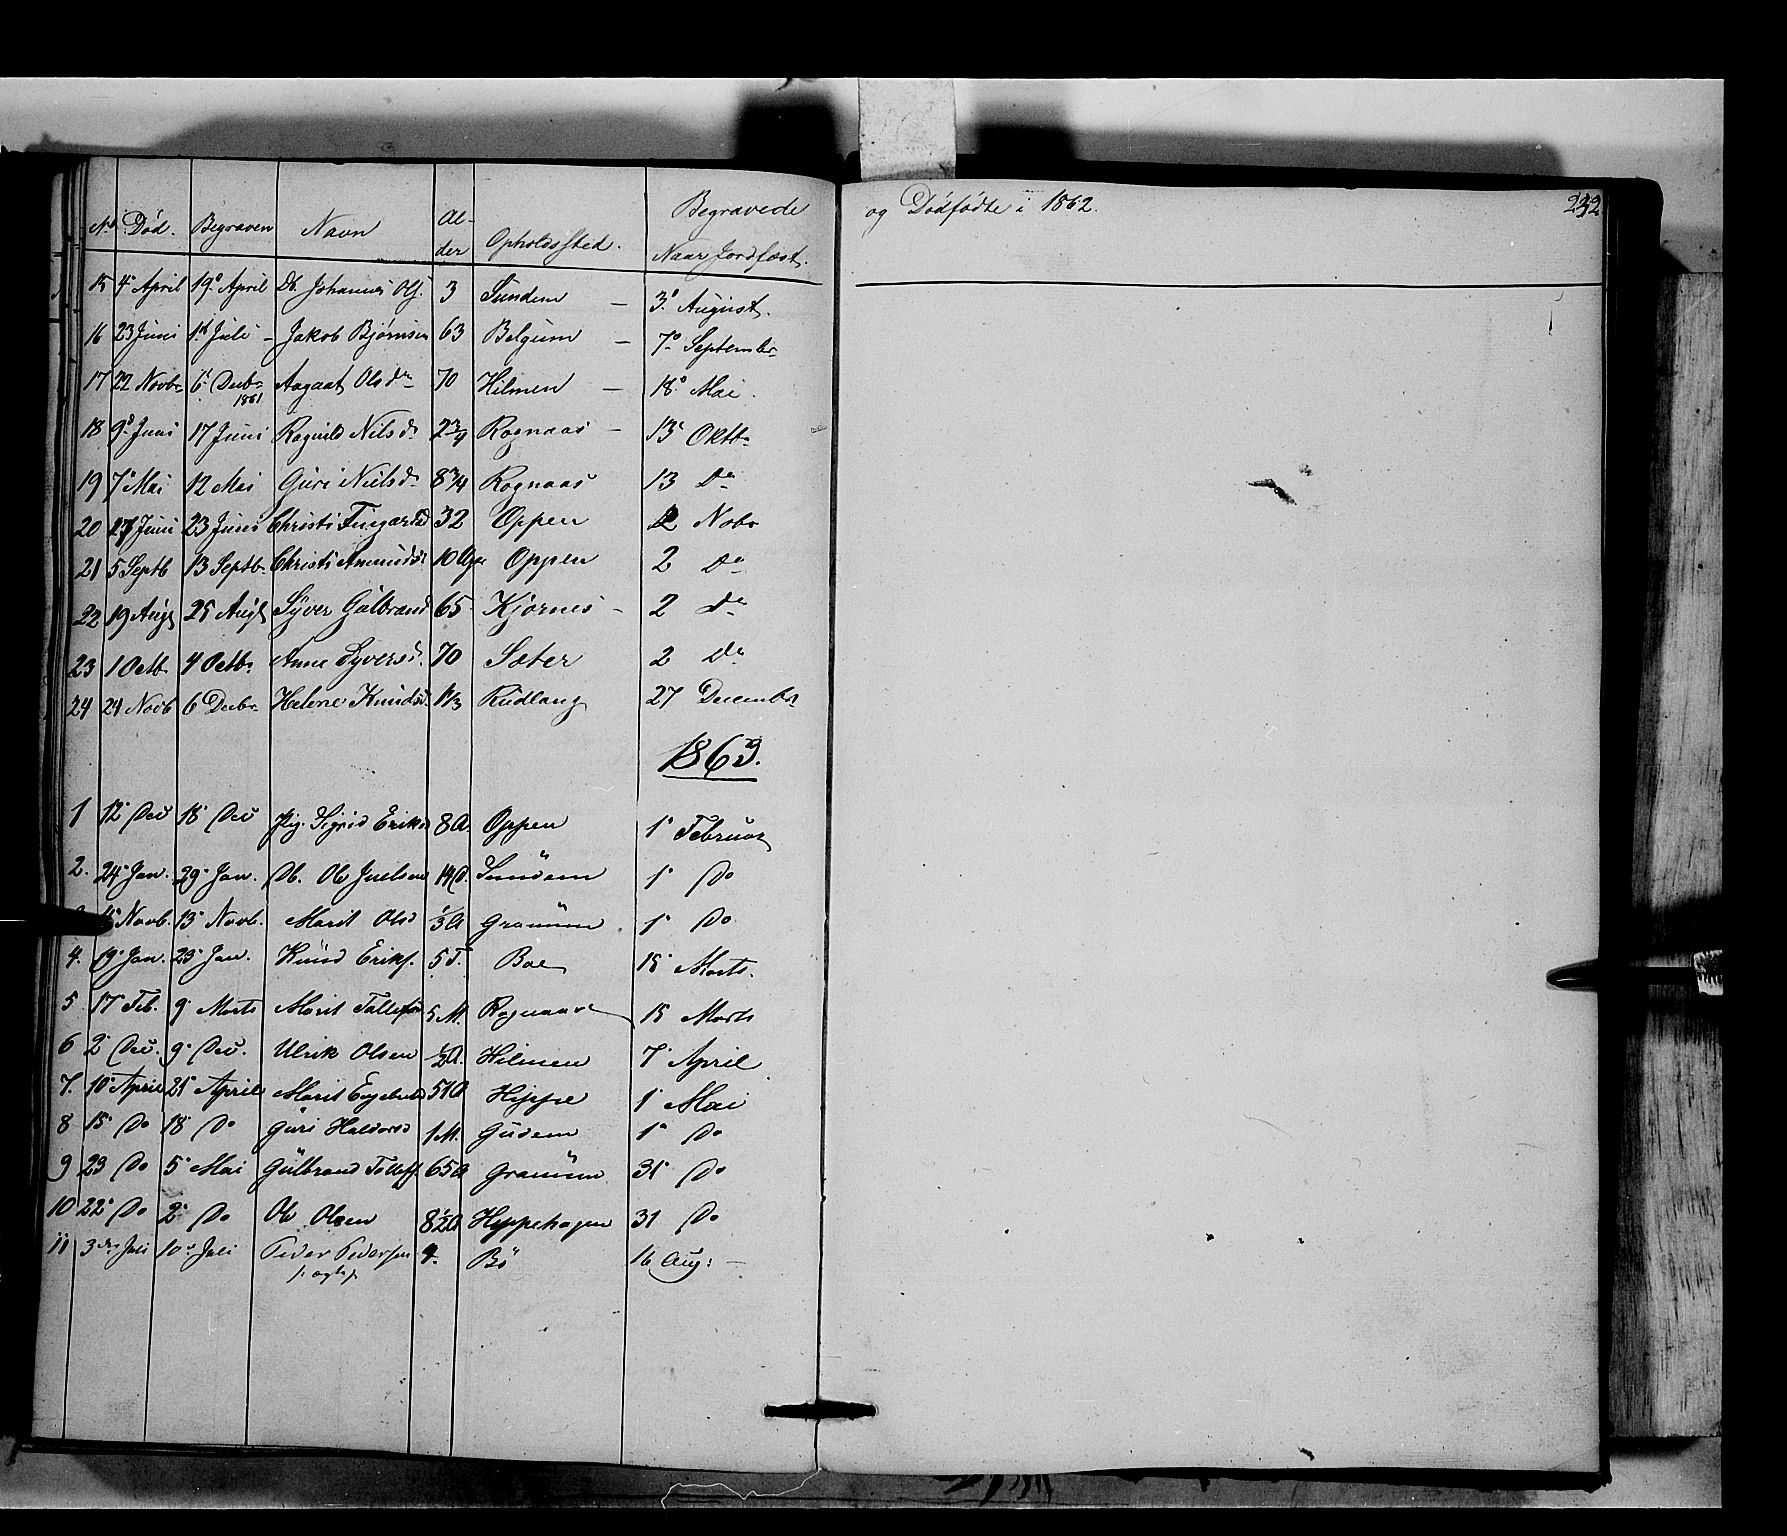 SAH, Nord-Aurdal prestekontor, Ministerialbok nr. 6, 1842-1863, s. 232